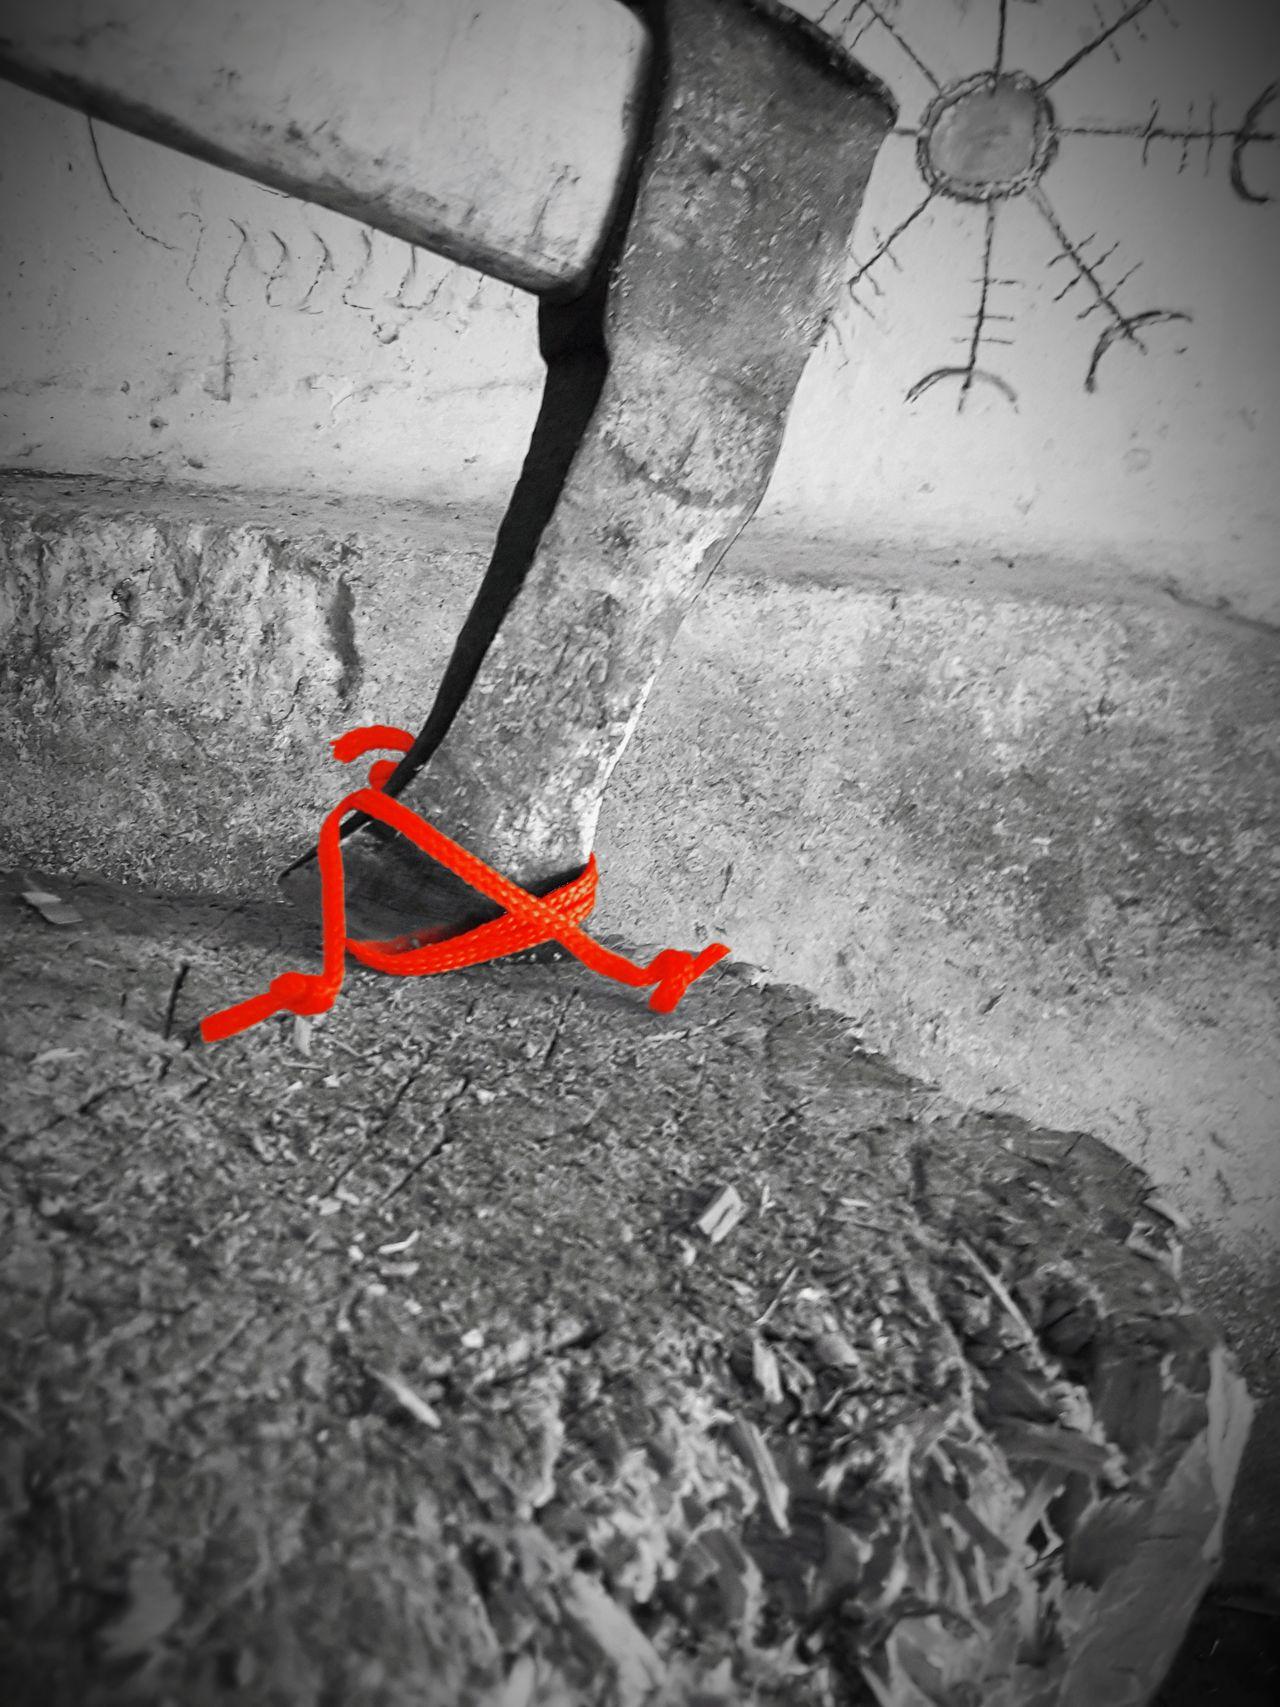 Ax Viking Aegishjalmur Rope Blood Pagans Valhalla Ragnarok